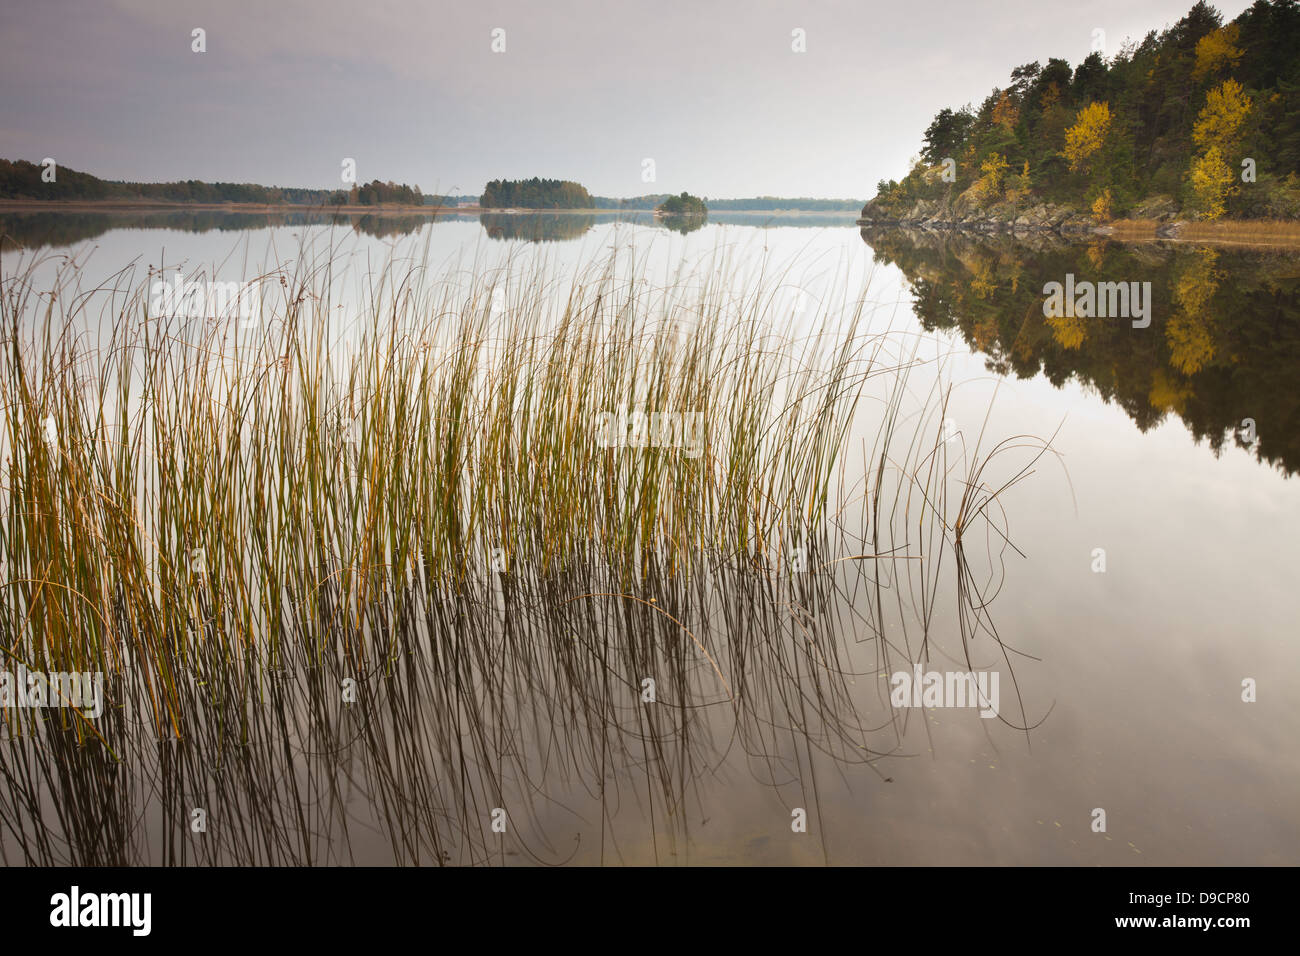 Tranquillo paesaggio autunnale a Hvalbukt nel lago Vansjø, Østfold fylke, Norvegia. Immagini Stock